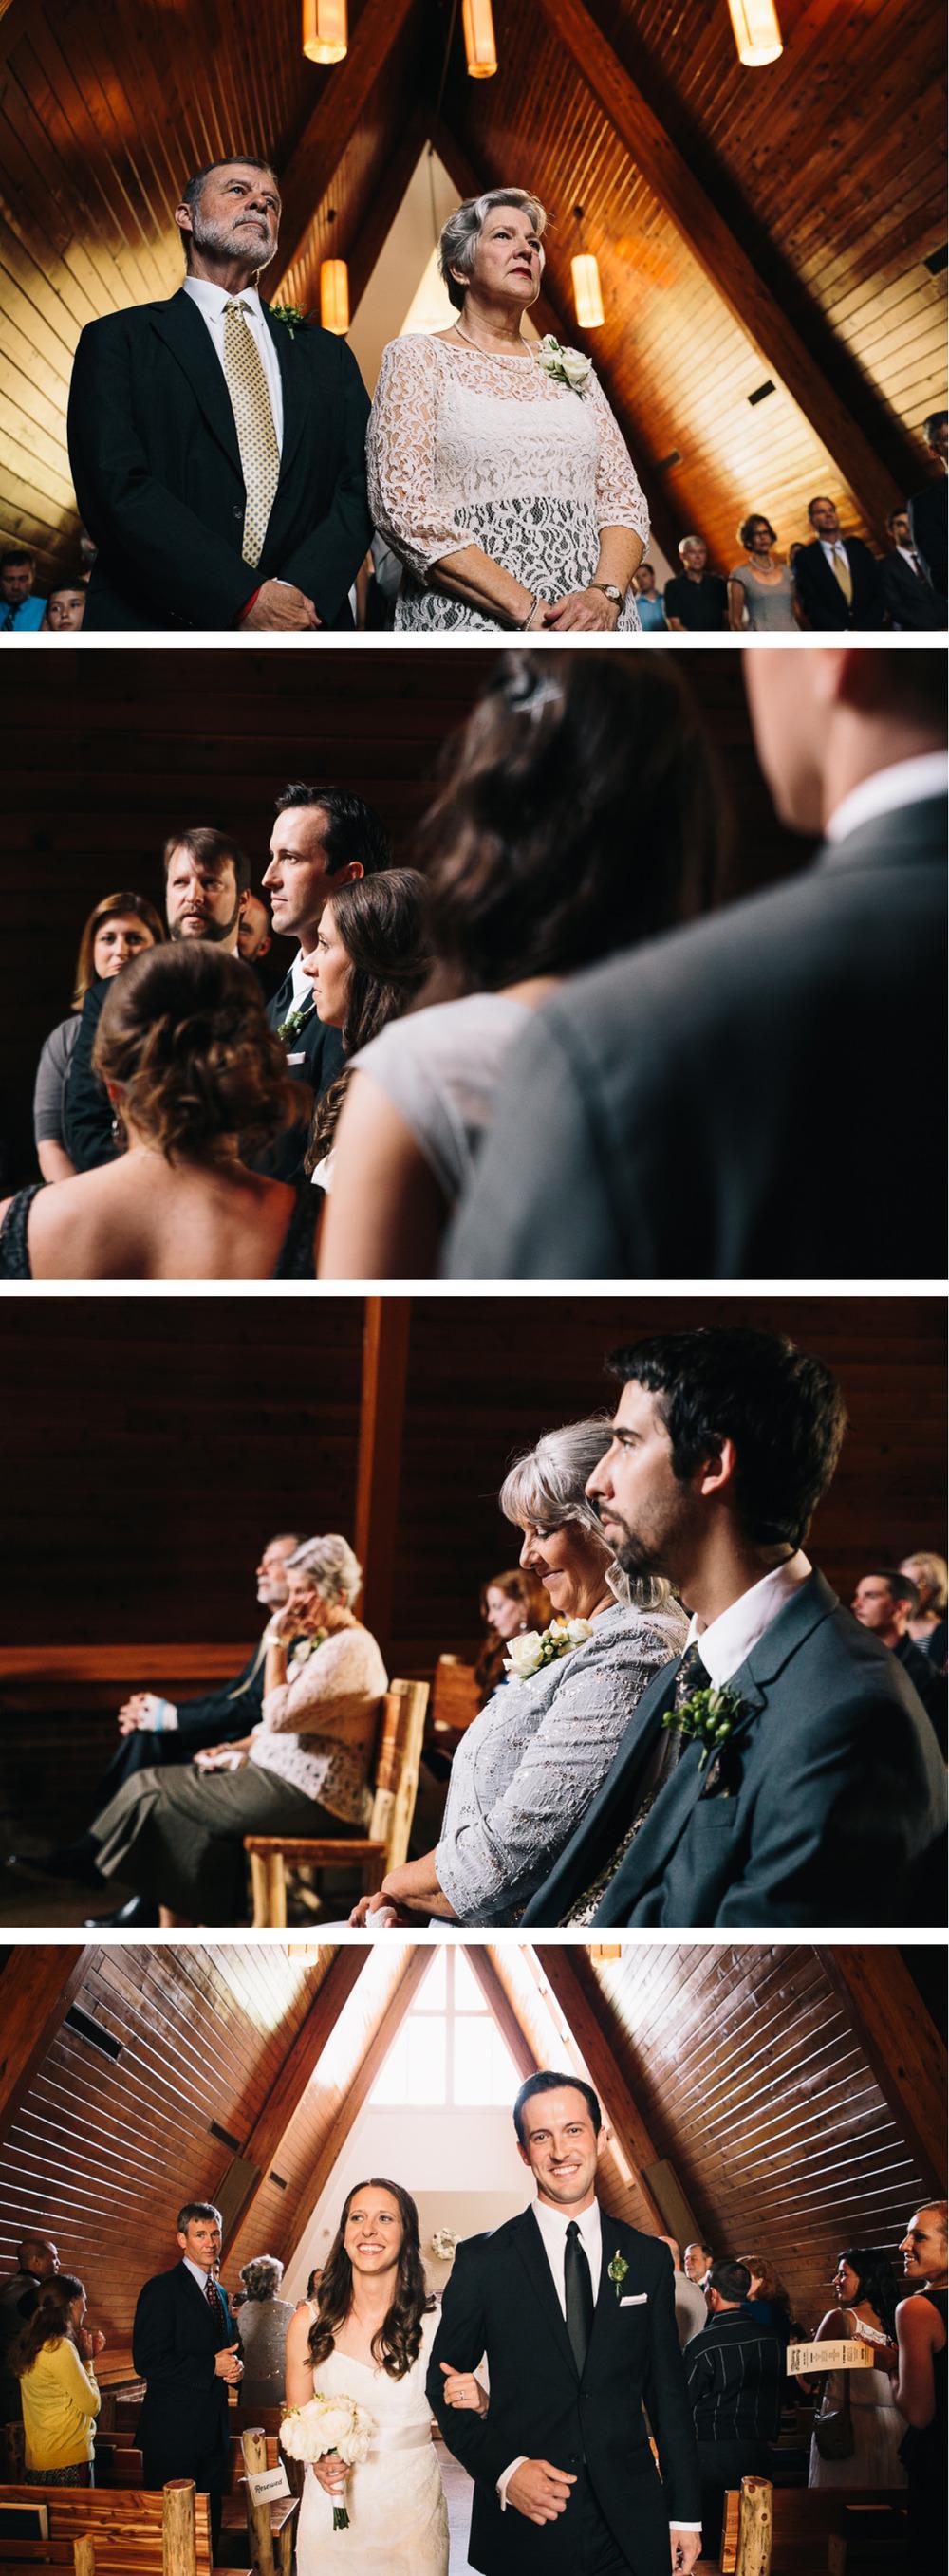 CK-Photo-Nashville-Wedding-Photographer-mh5.jpg